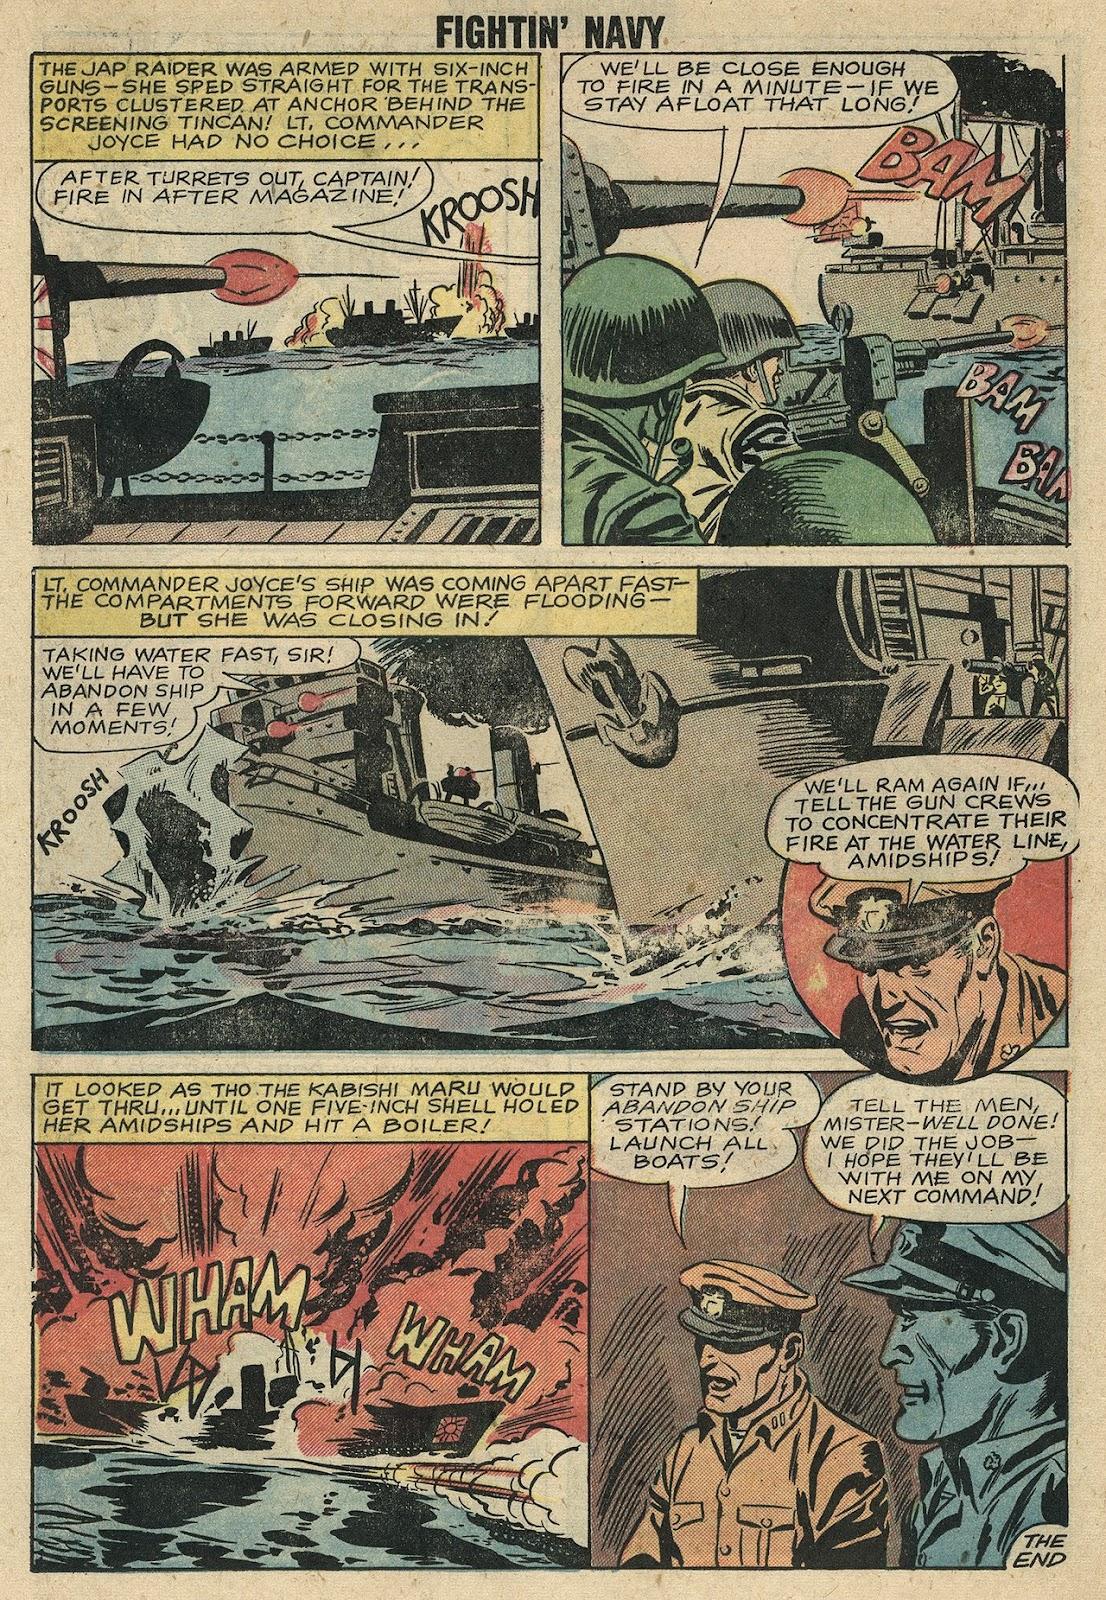 Read online Fightin' Navy comic -  Issue #86 - 13